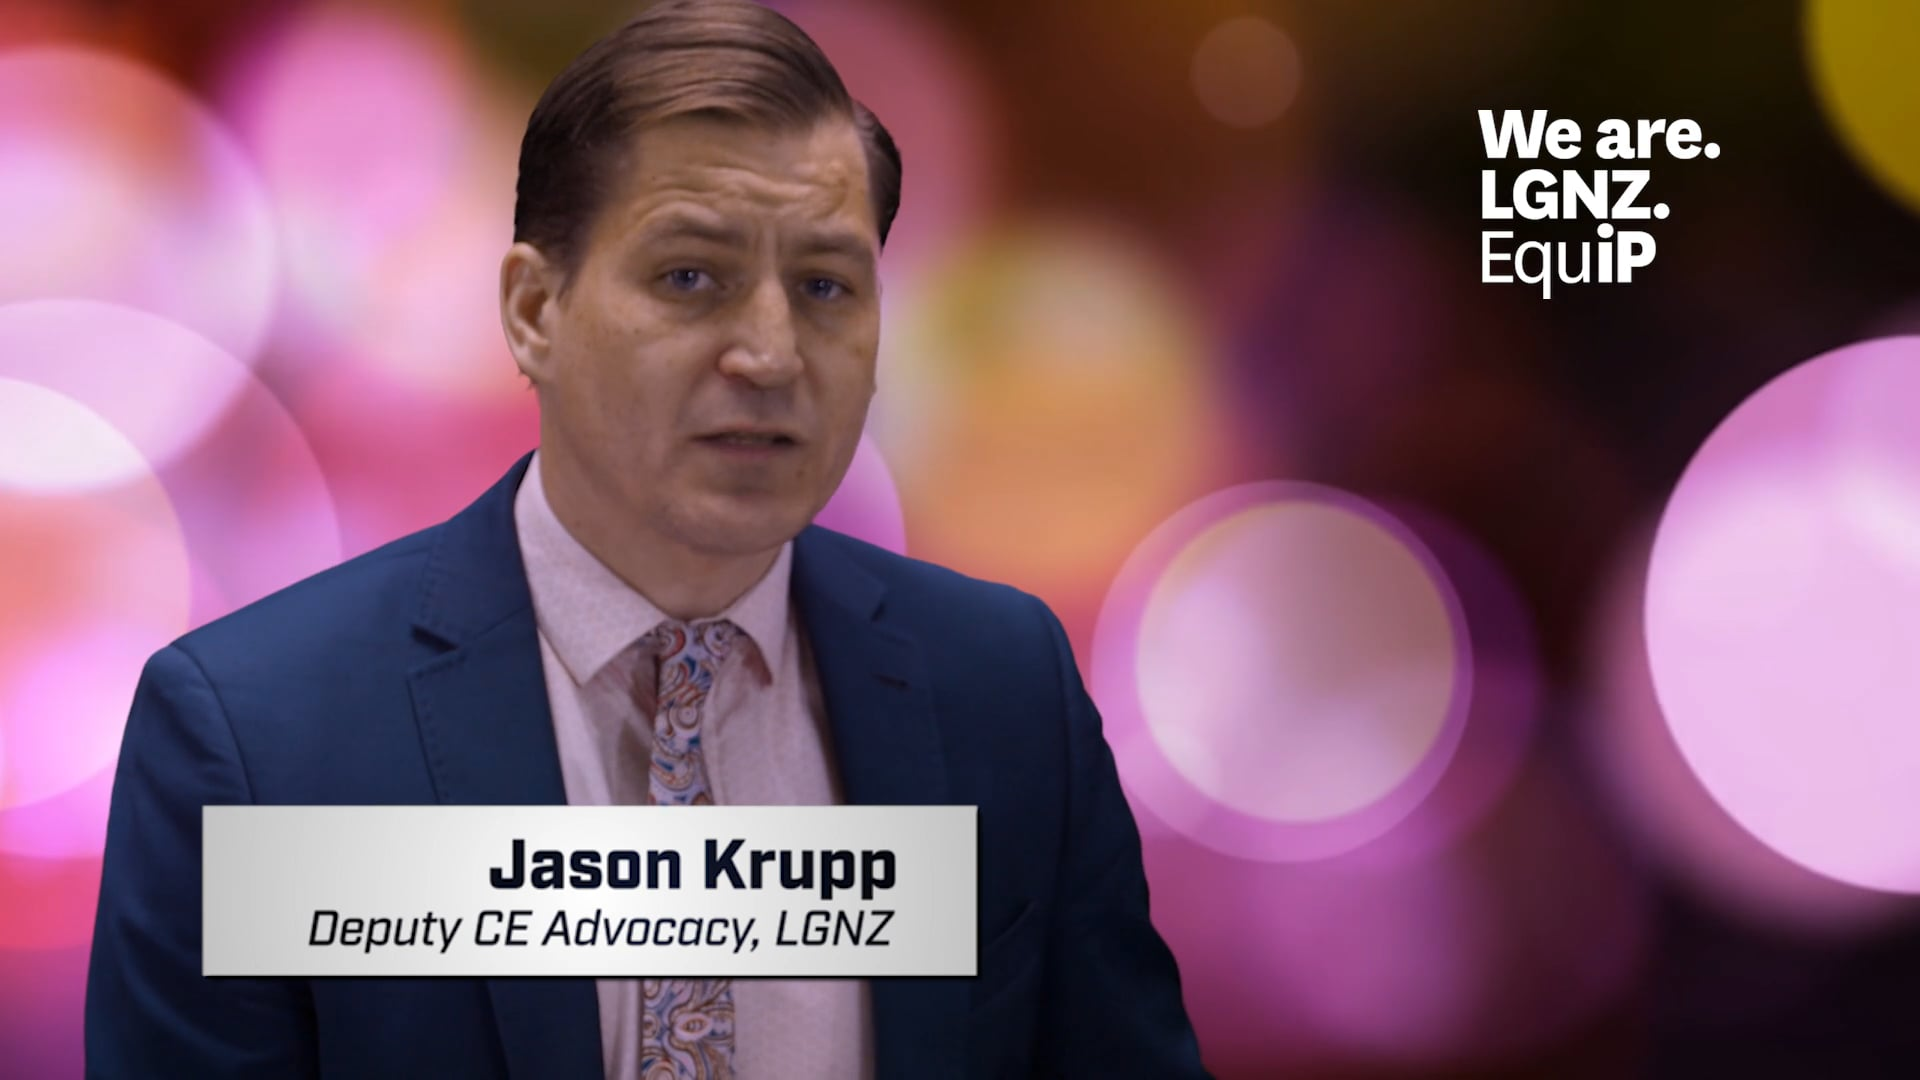 Jason Krupp, Deputy CE Advocacy, LGNZ